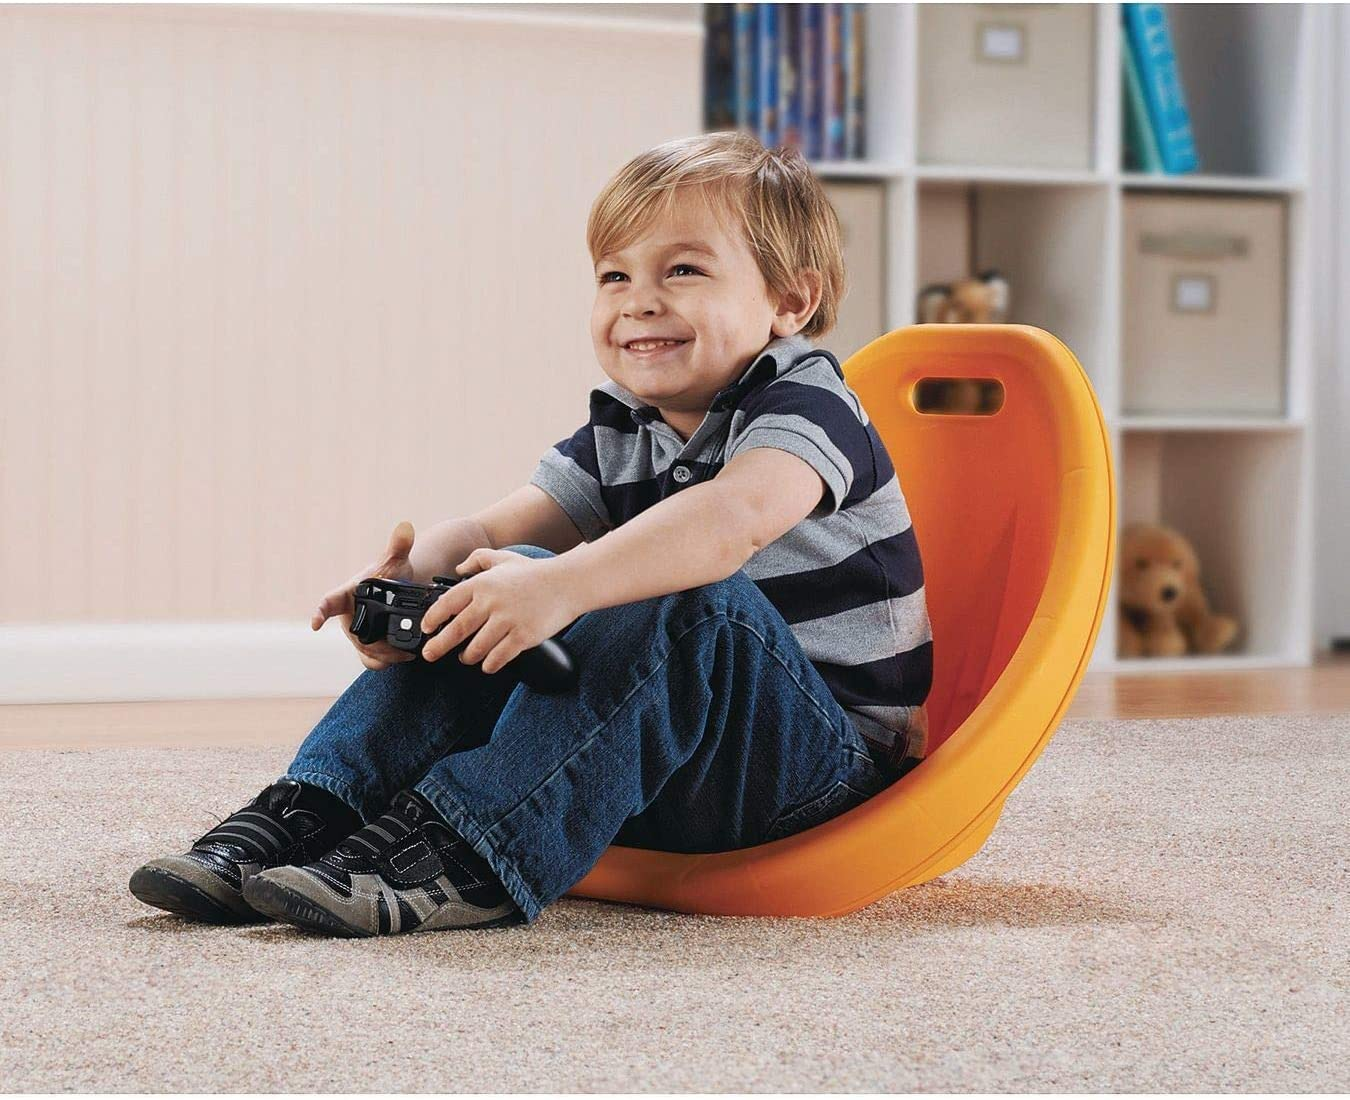 Pack of 6 American Plastic Toys Scoop Rocker Seats